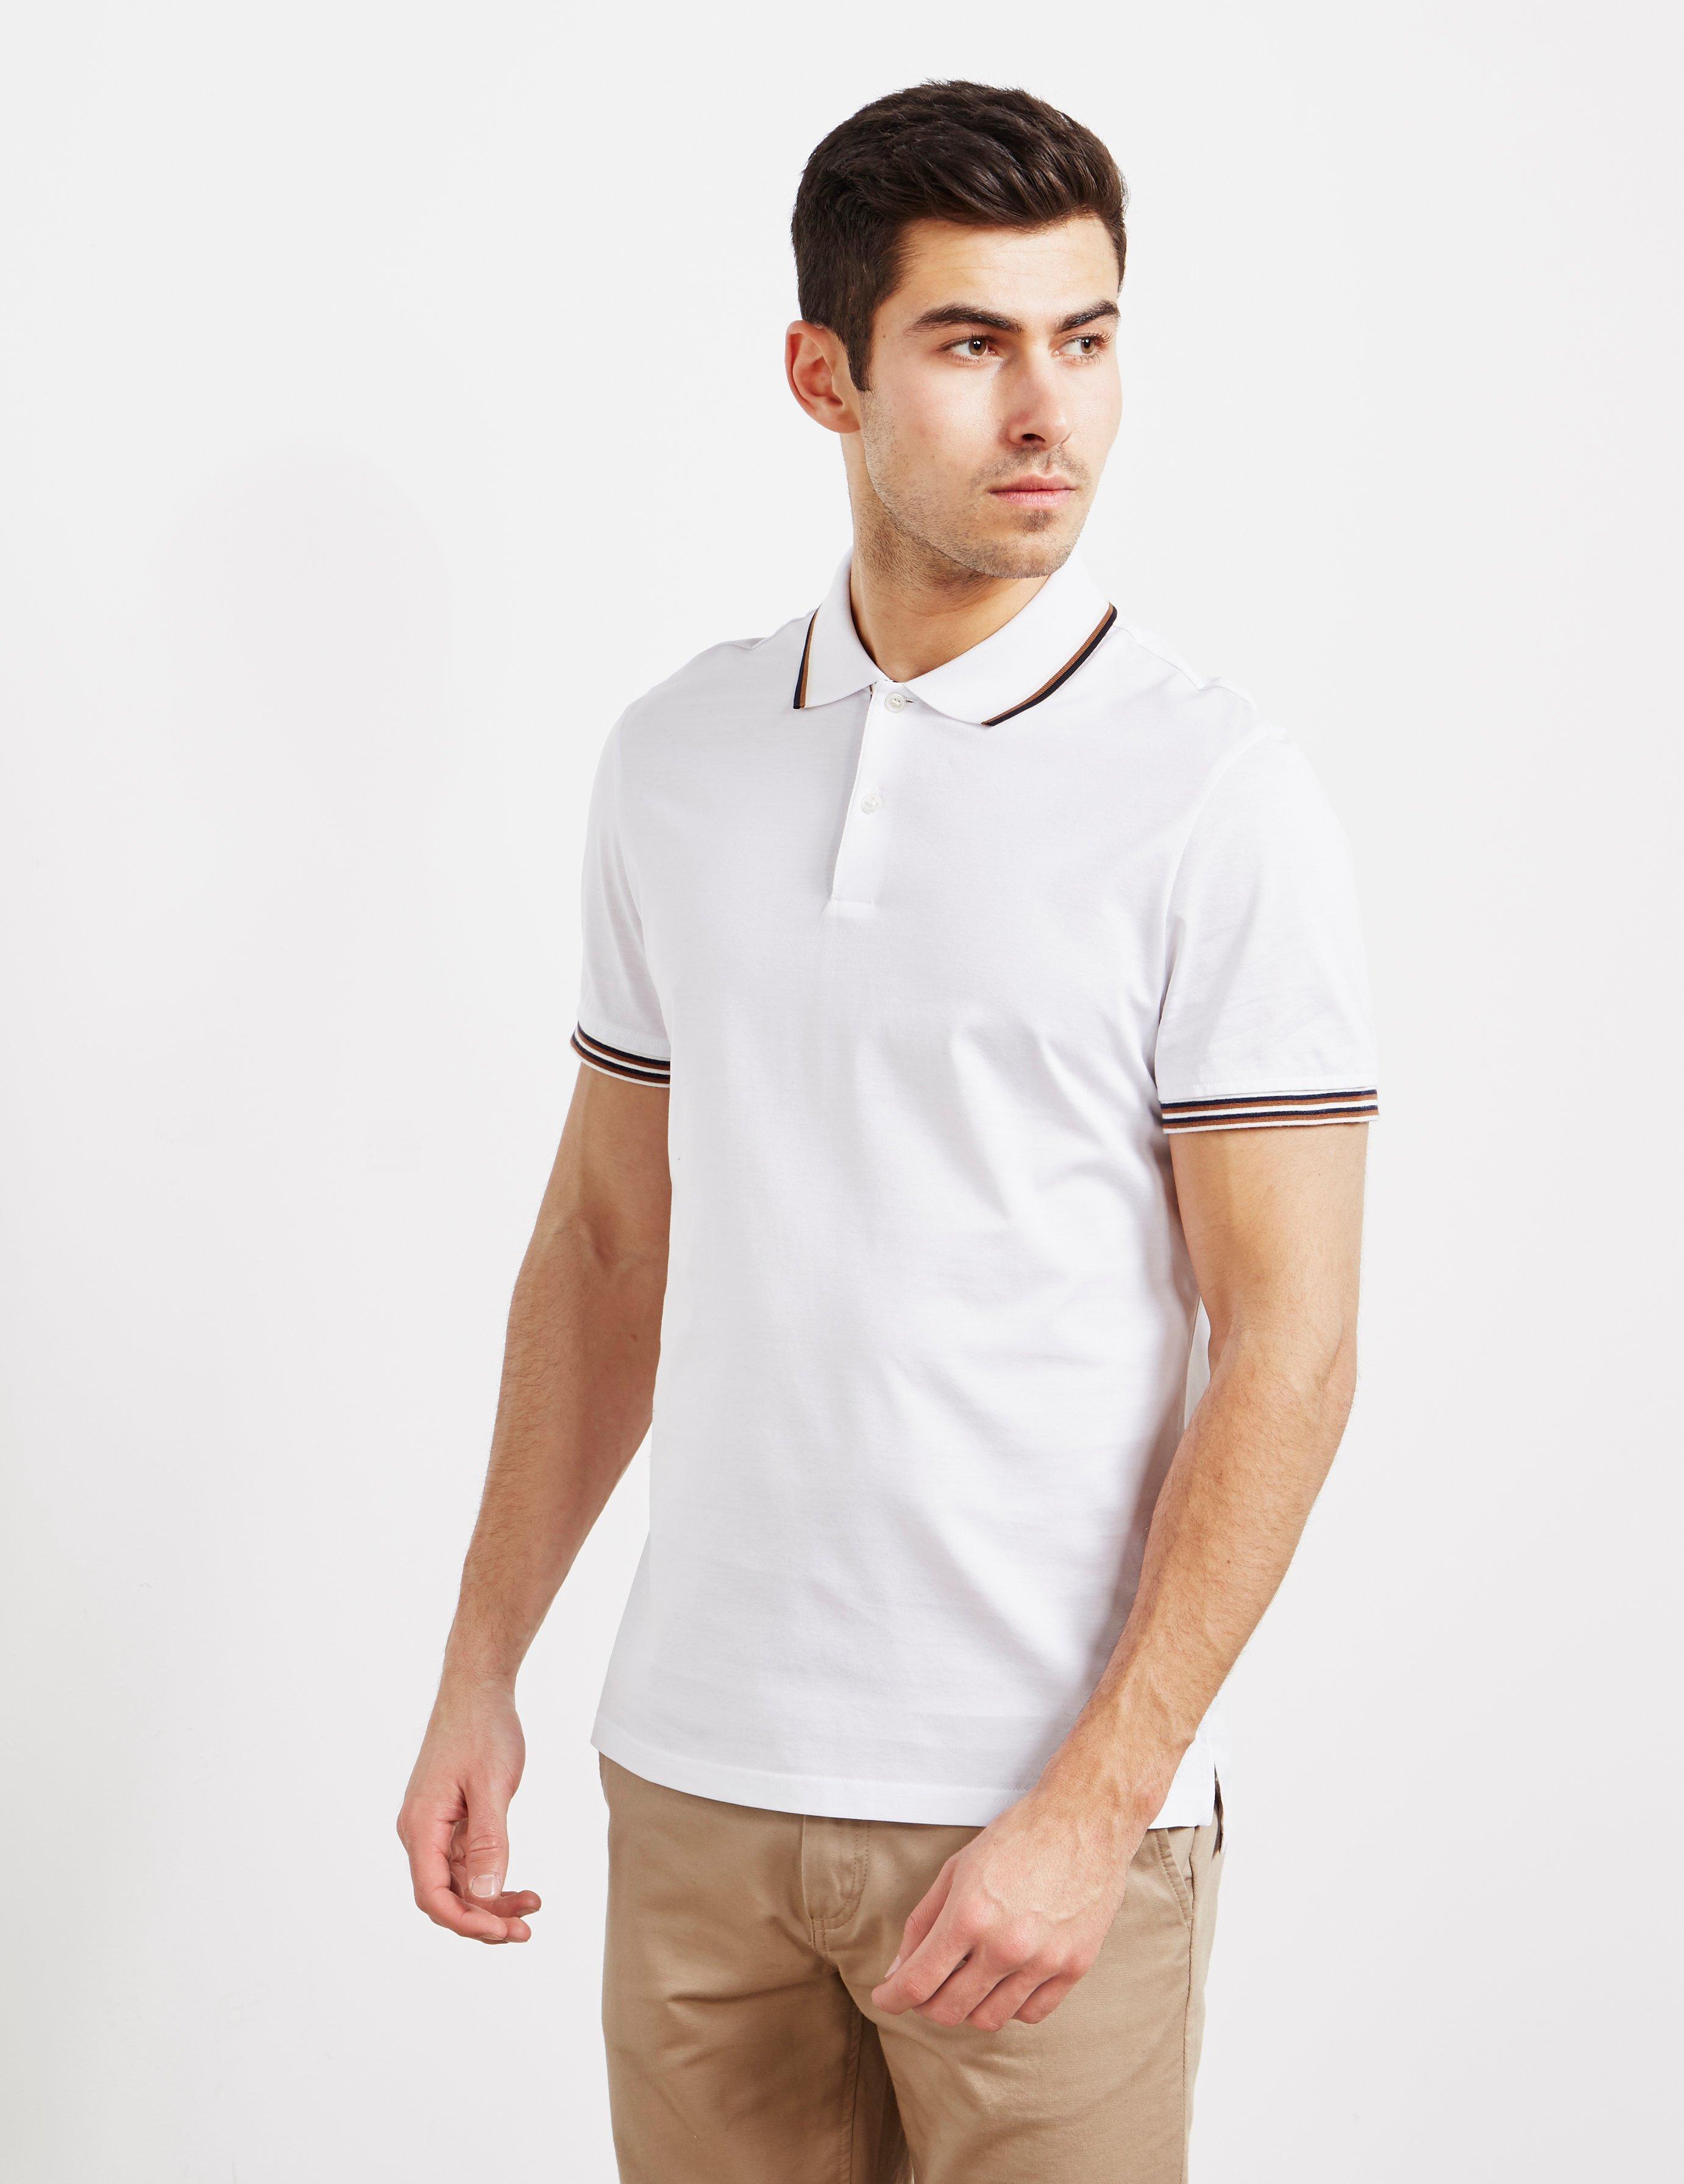 4f4732731 Lyst - Aquascutum Tipped Collar Short Sleeve Polo Shirt White in ...